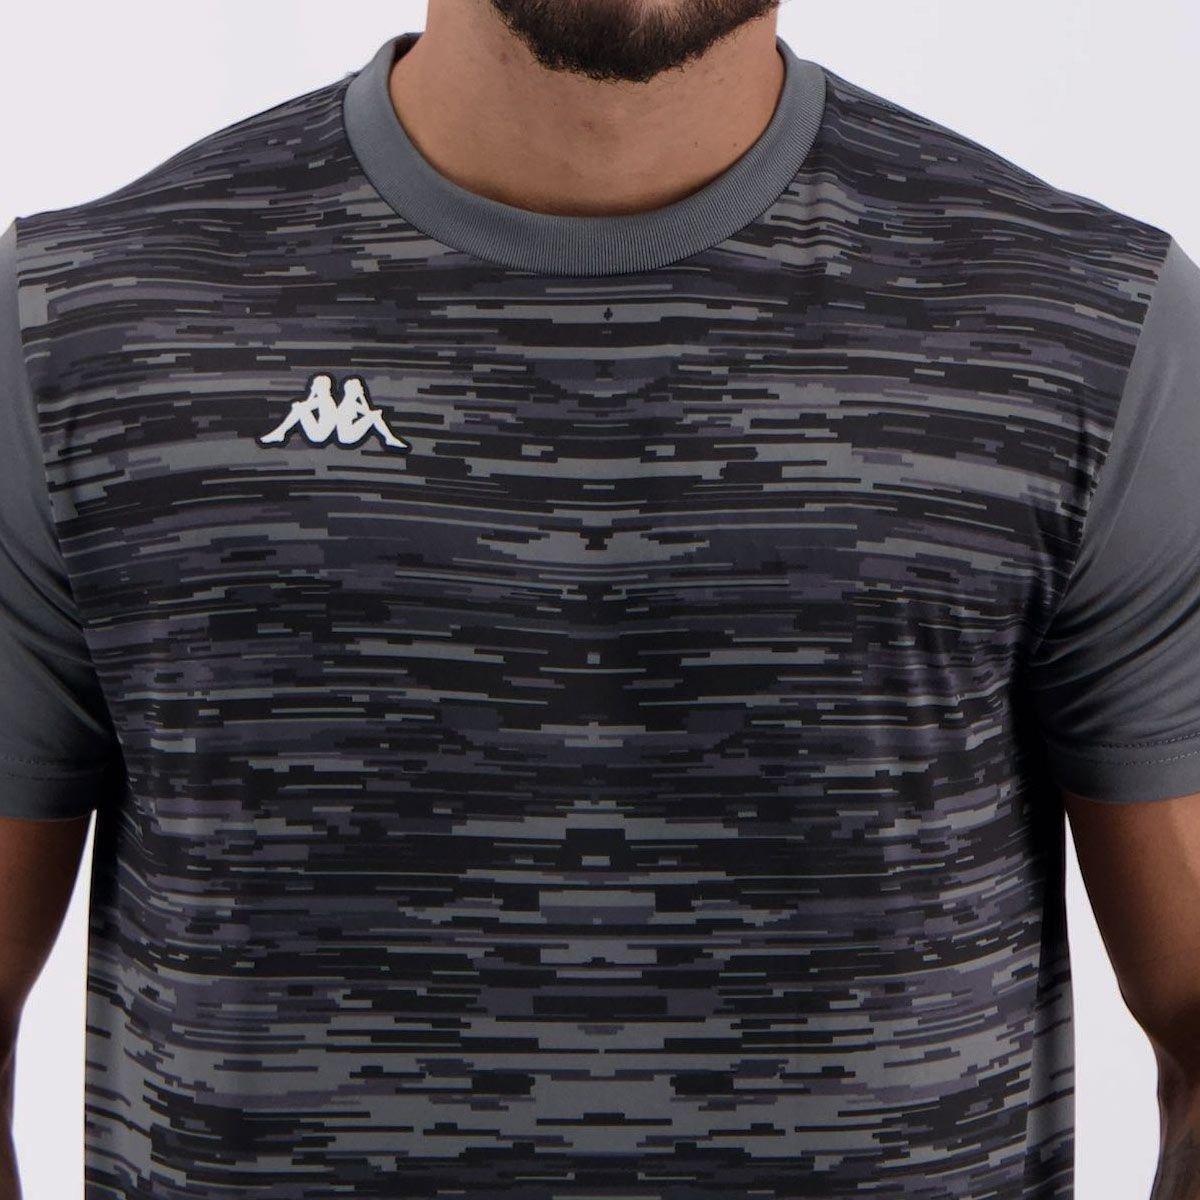 Camisa Kappa Jenner Masculina - Chumbo - Compre Agora  0bd4c79465740